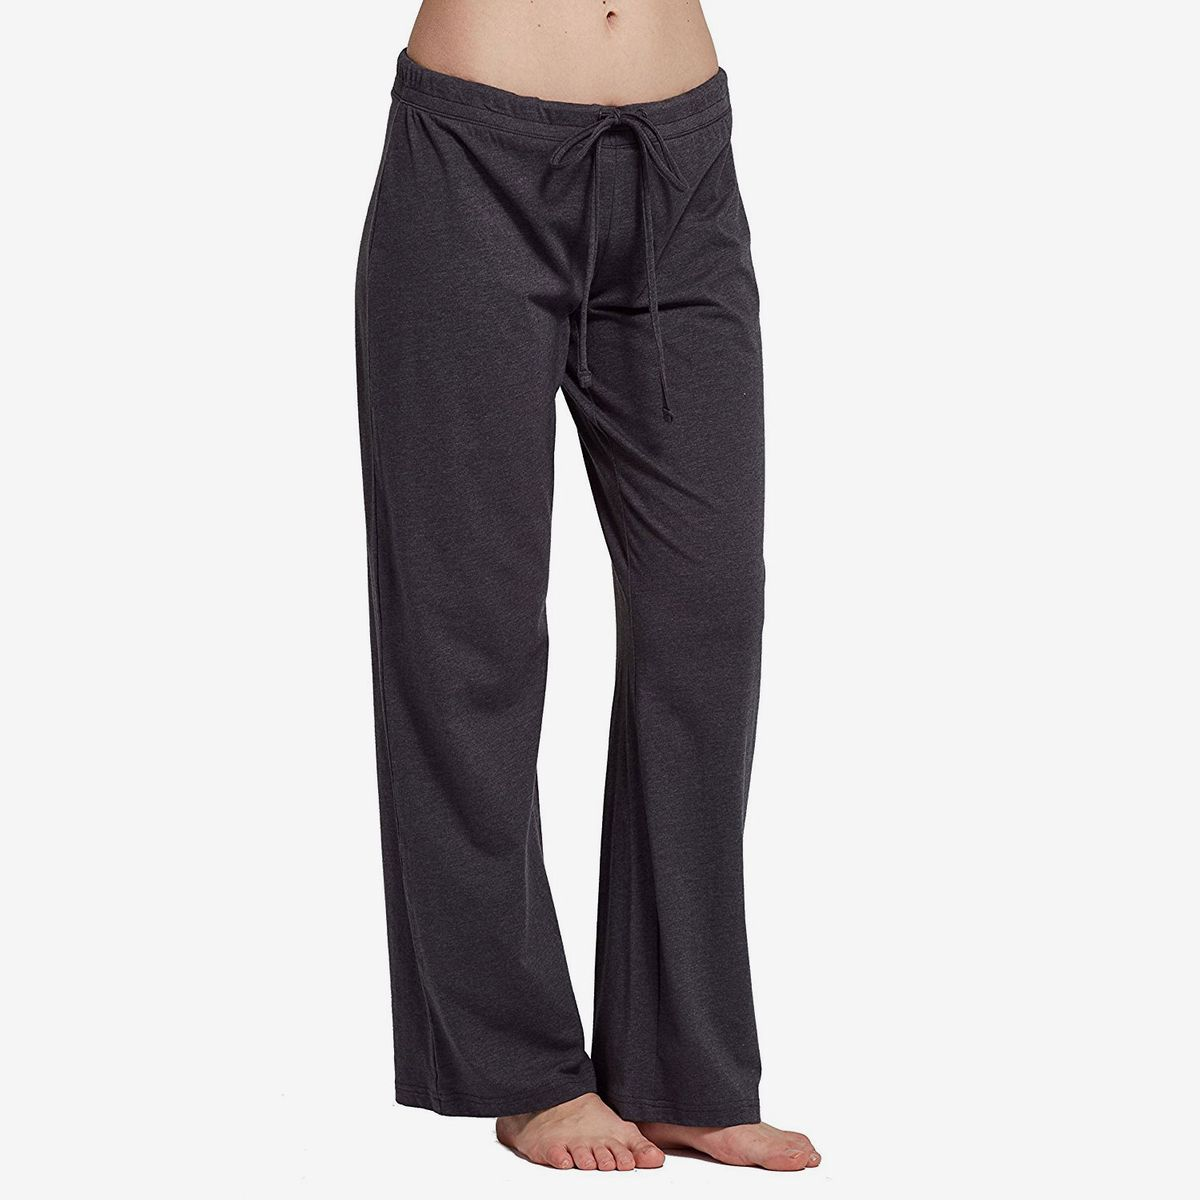 Motherhood Maternity Womens Relaxed Fit Sleep Knit Shorts Pajama Bottom